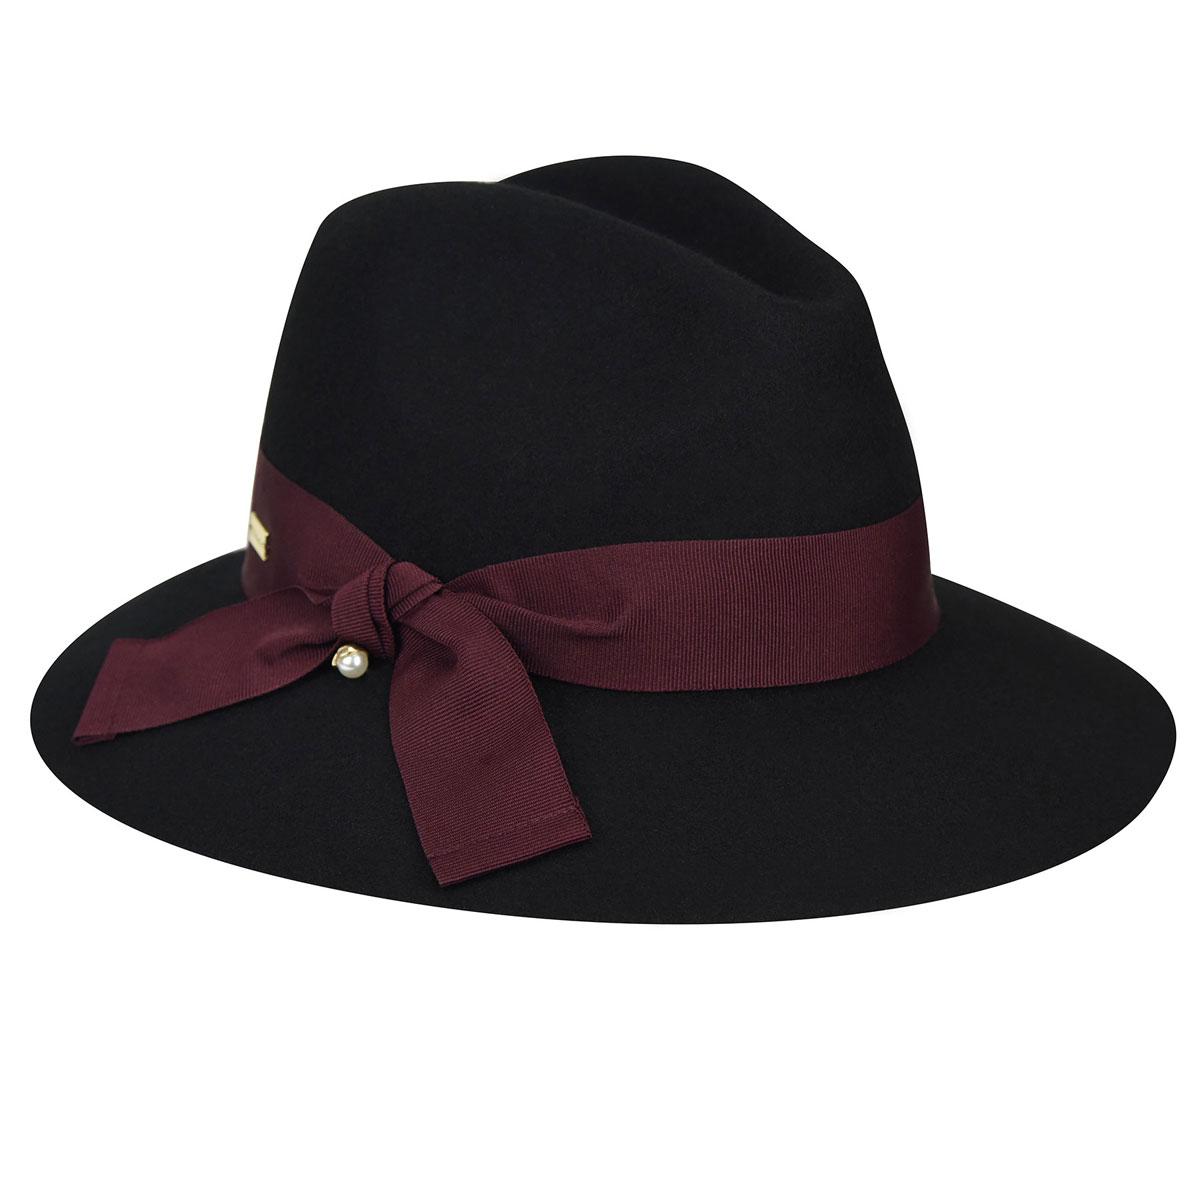 Women's Vintage Hats | Old Fashioned Hats | Retro Hats Bardot $66.00 AT vintagedancer.com